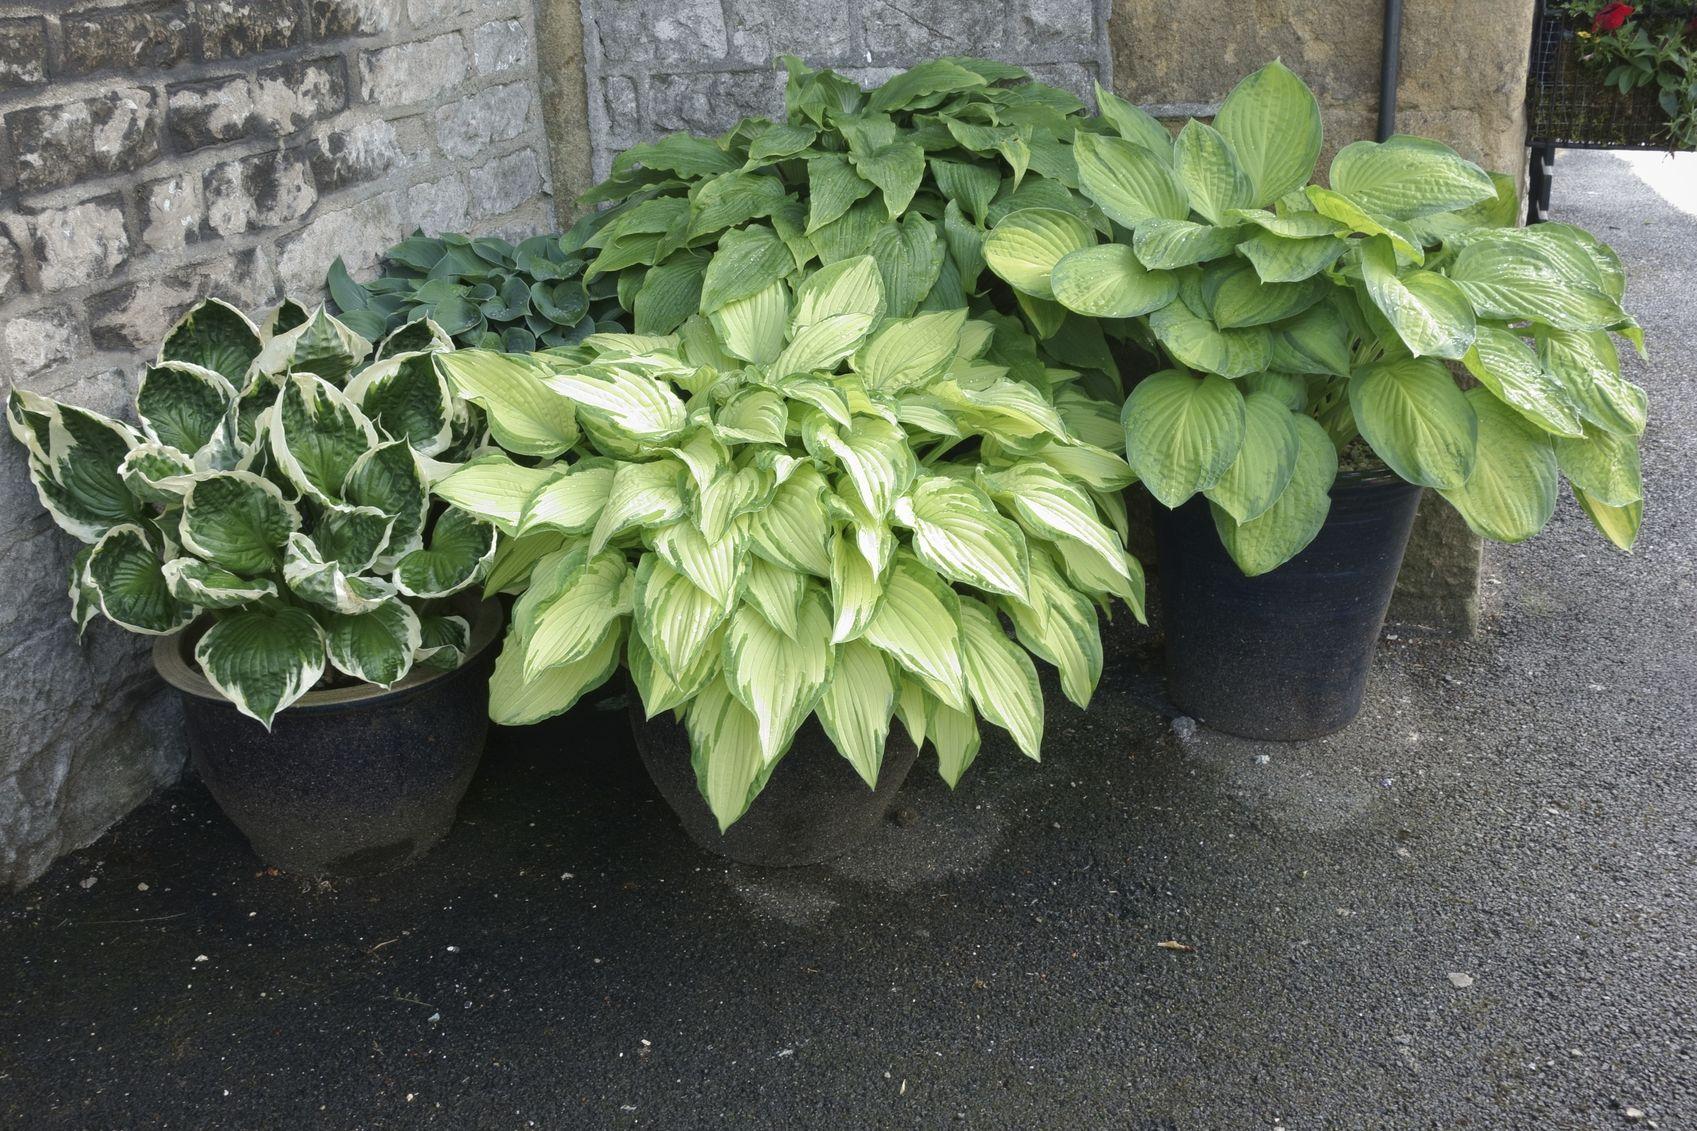 hosta houseplant care how to grow hosta indoors hosta pinterest rh pinterest com